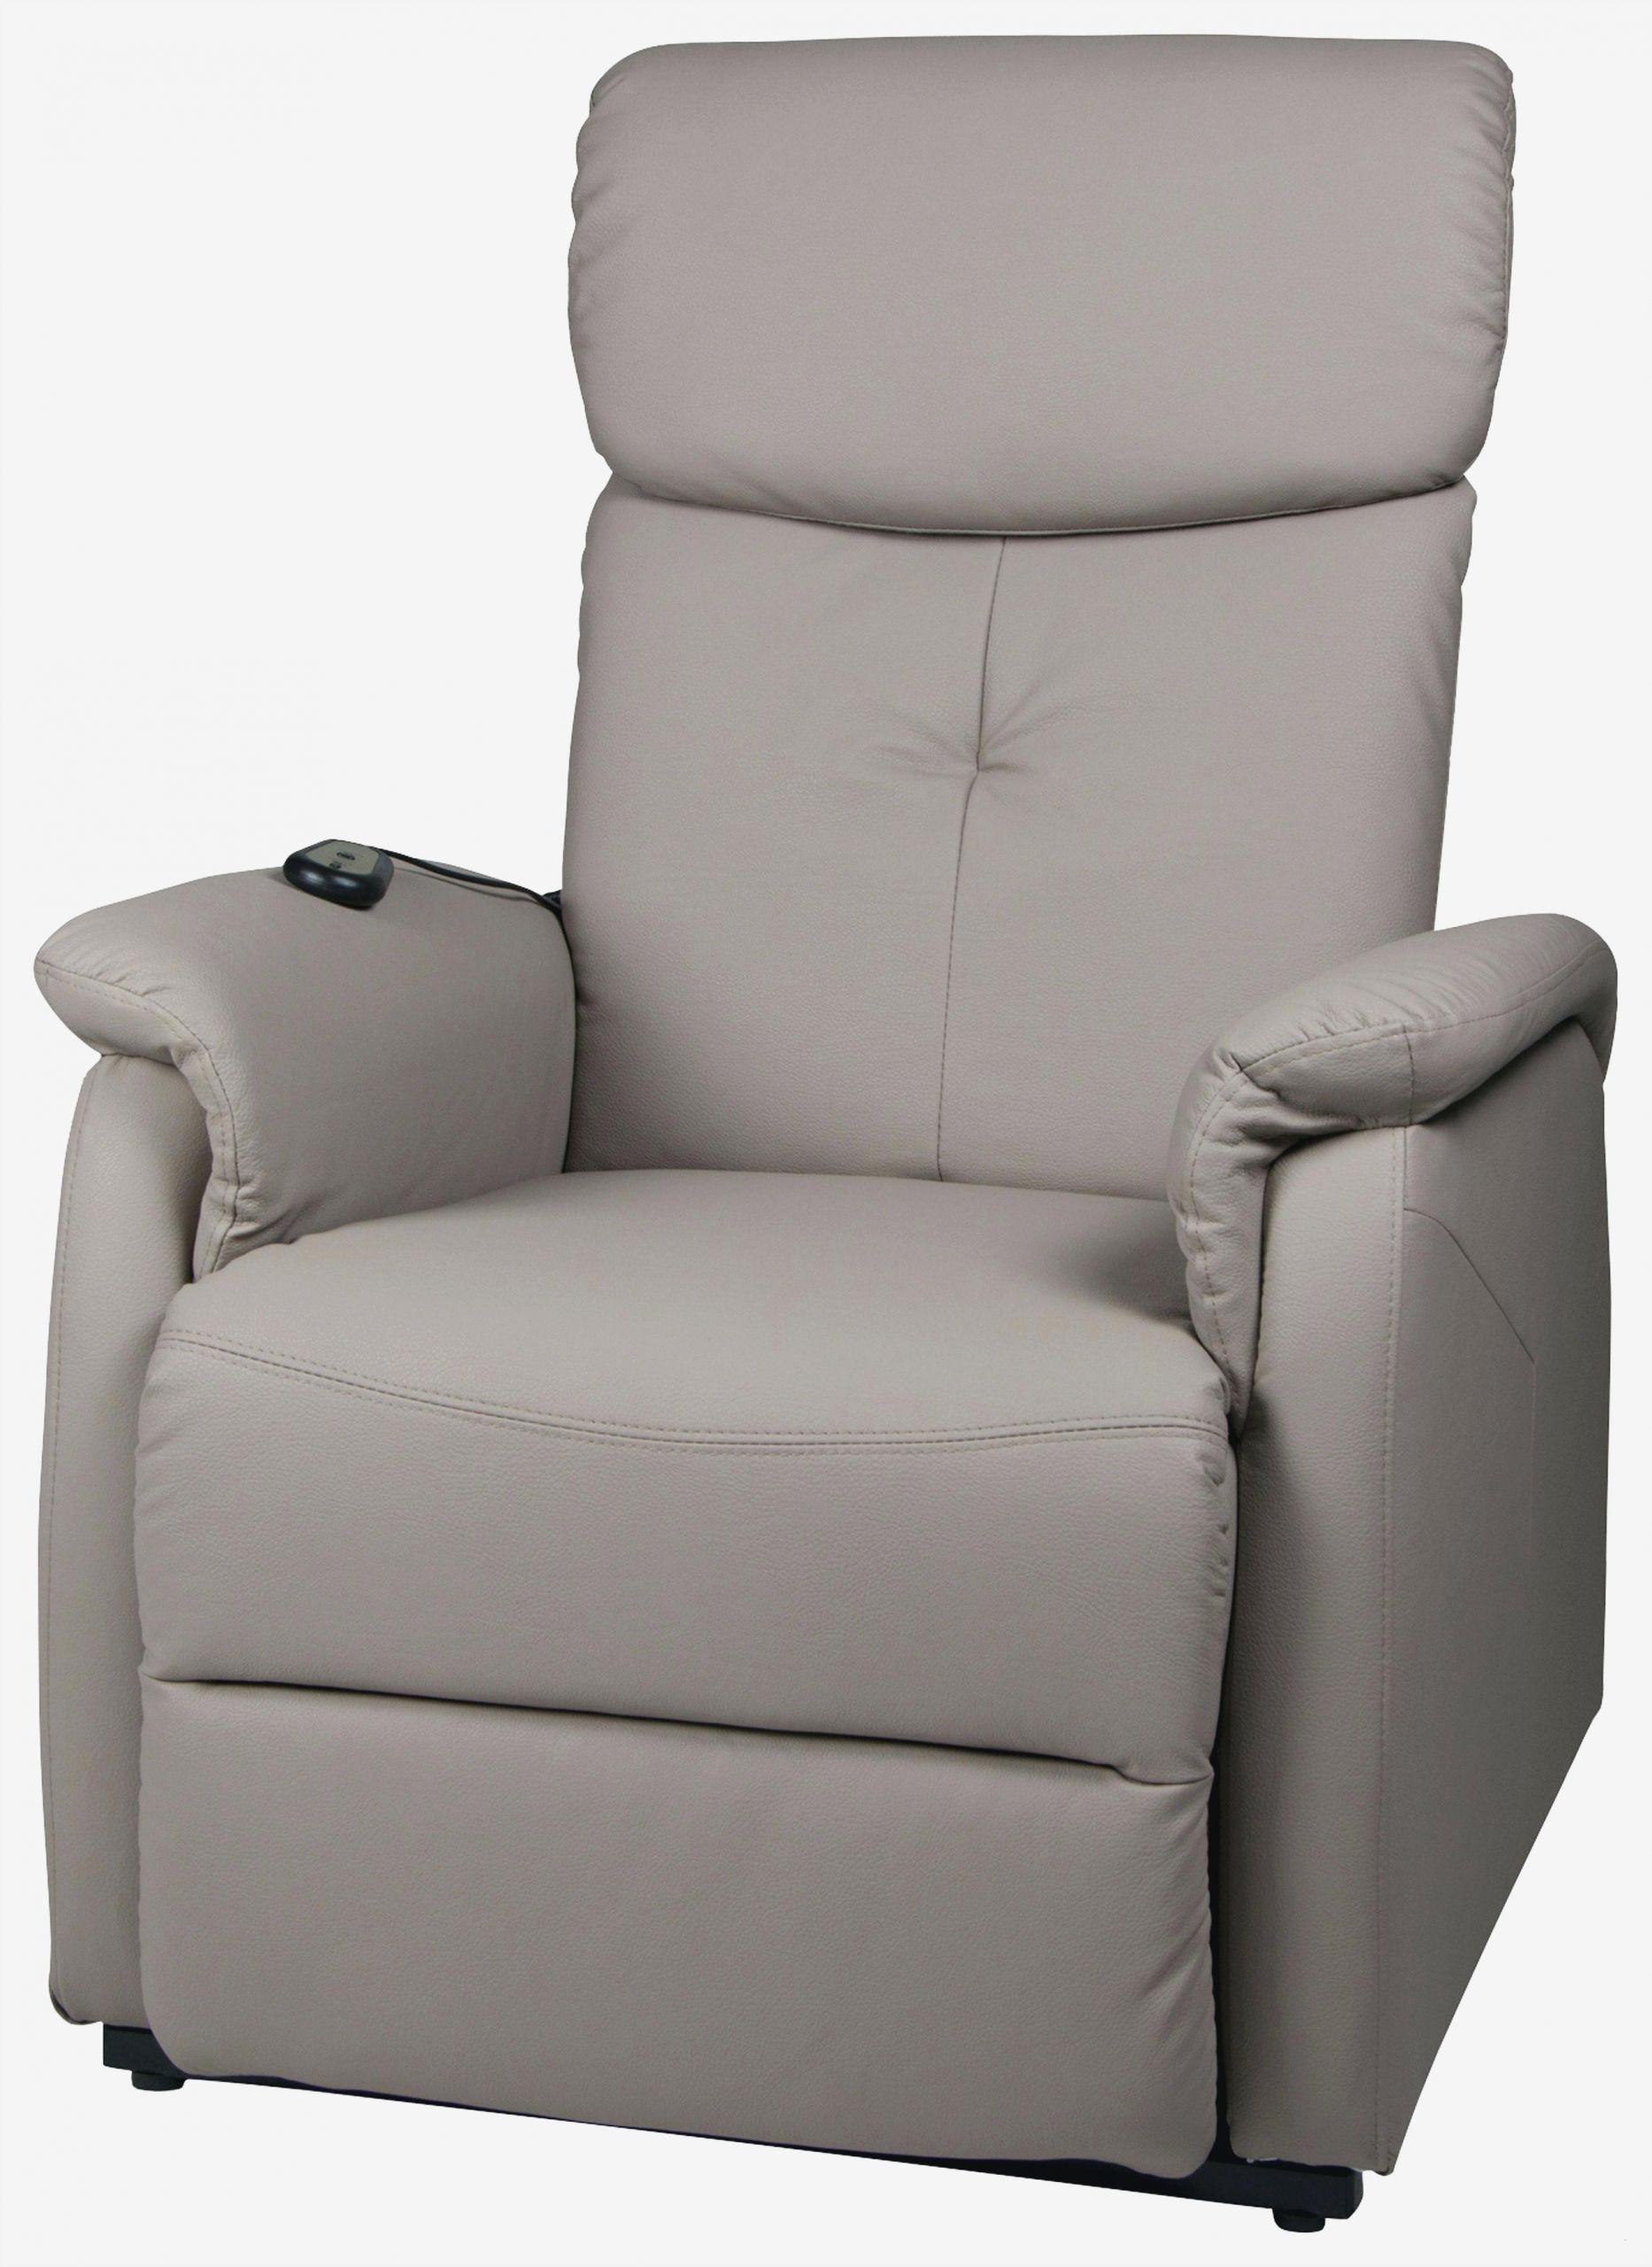 Full Size of Wohnzimmer Einzelsessel Sessel In Wohnzimmer Integrieren Vitra Wohnzimmer Sessel Wohnzimmer Sessel Mit Aufstehhilfe Wohnzimmer Wohnzimmer Sessel